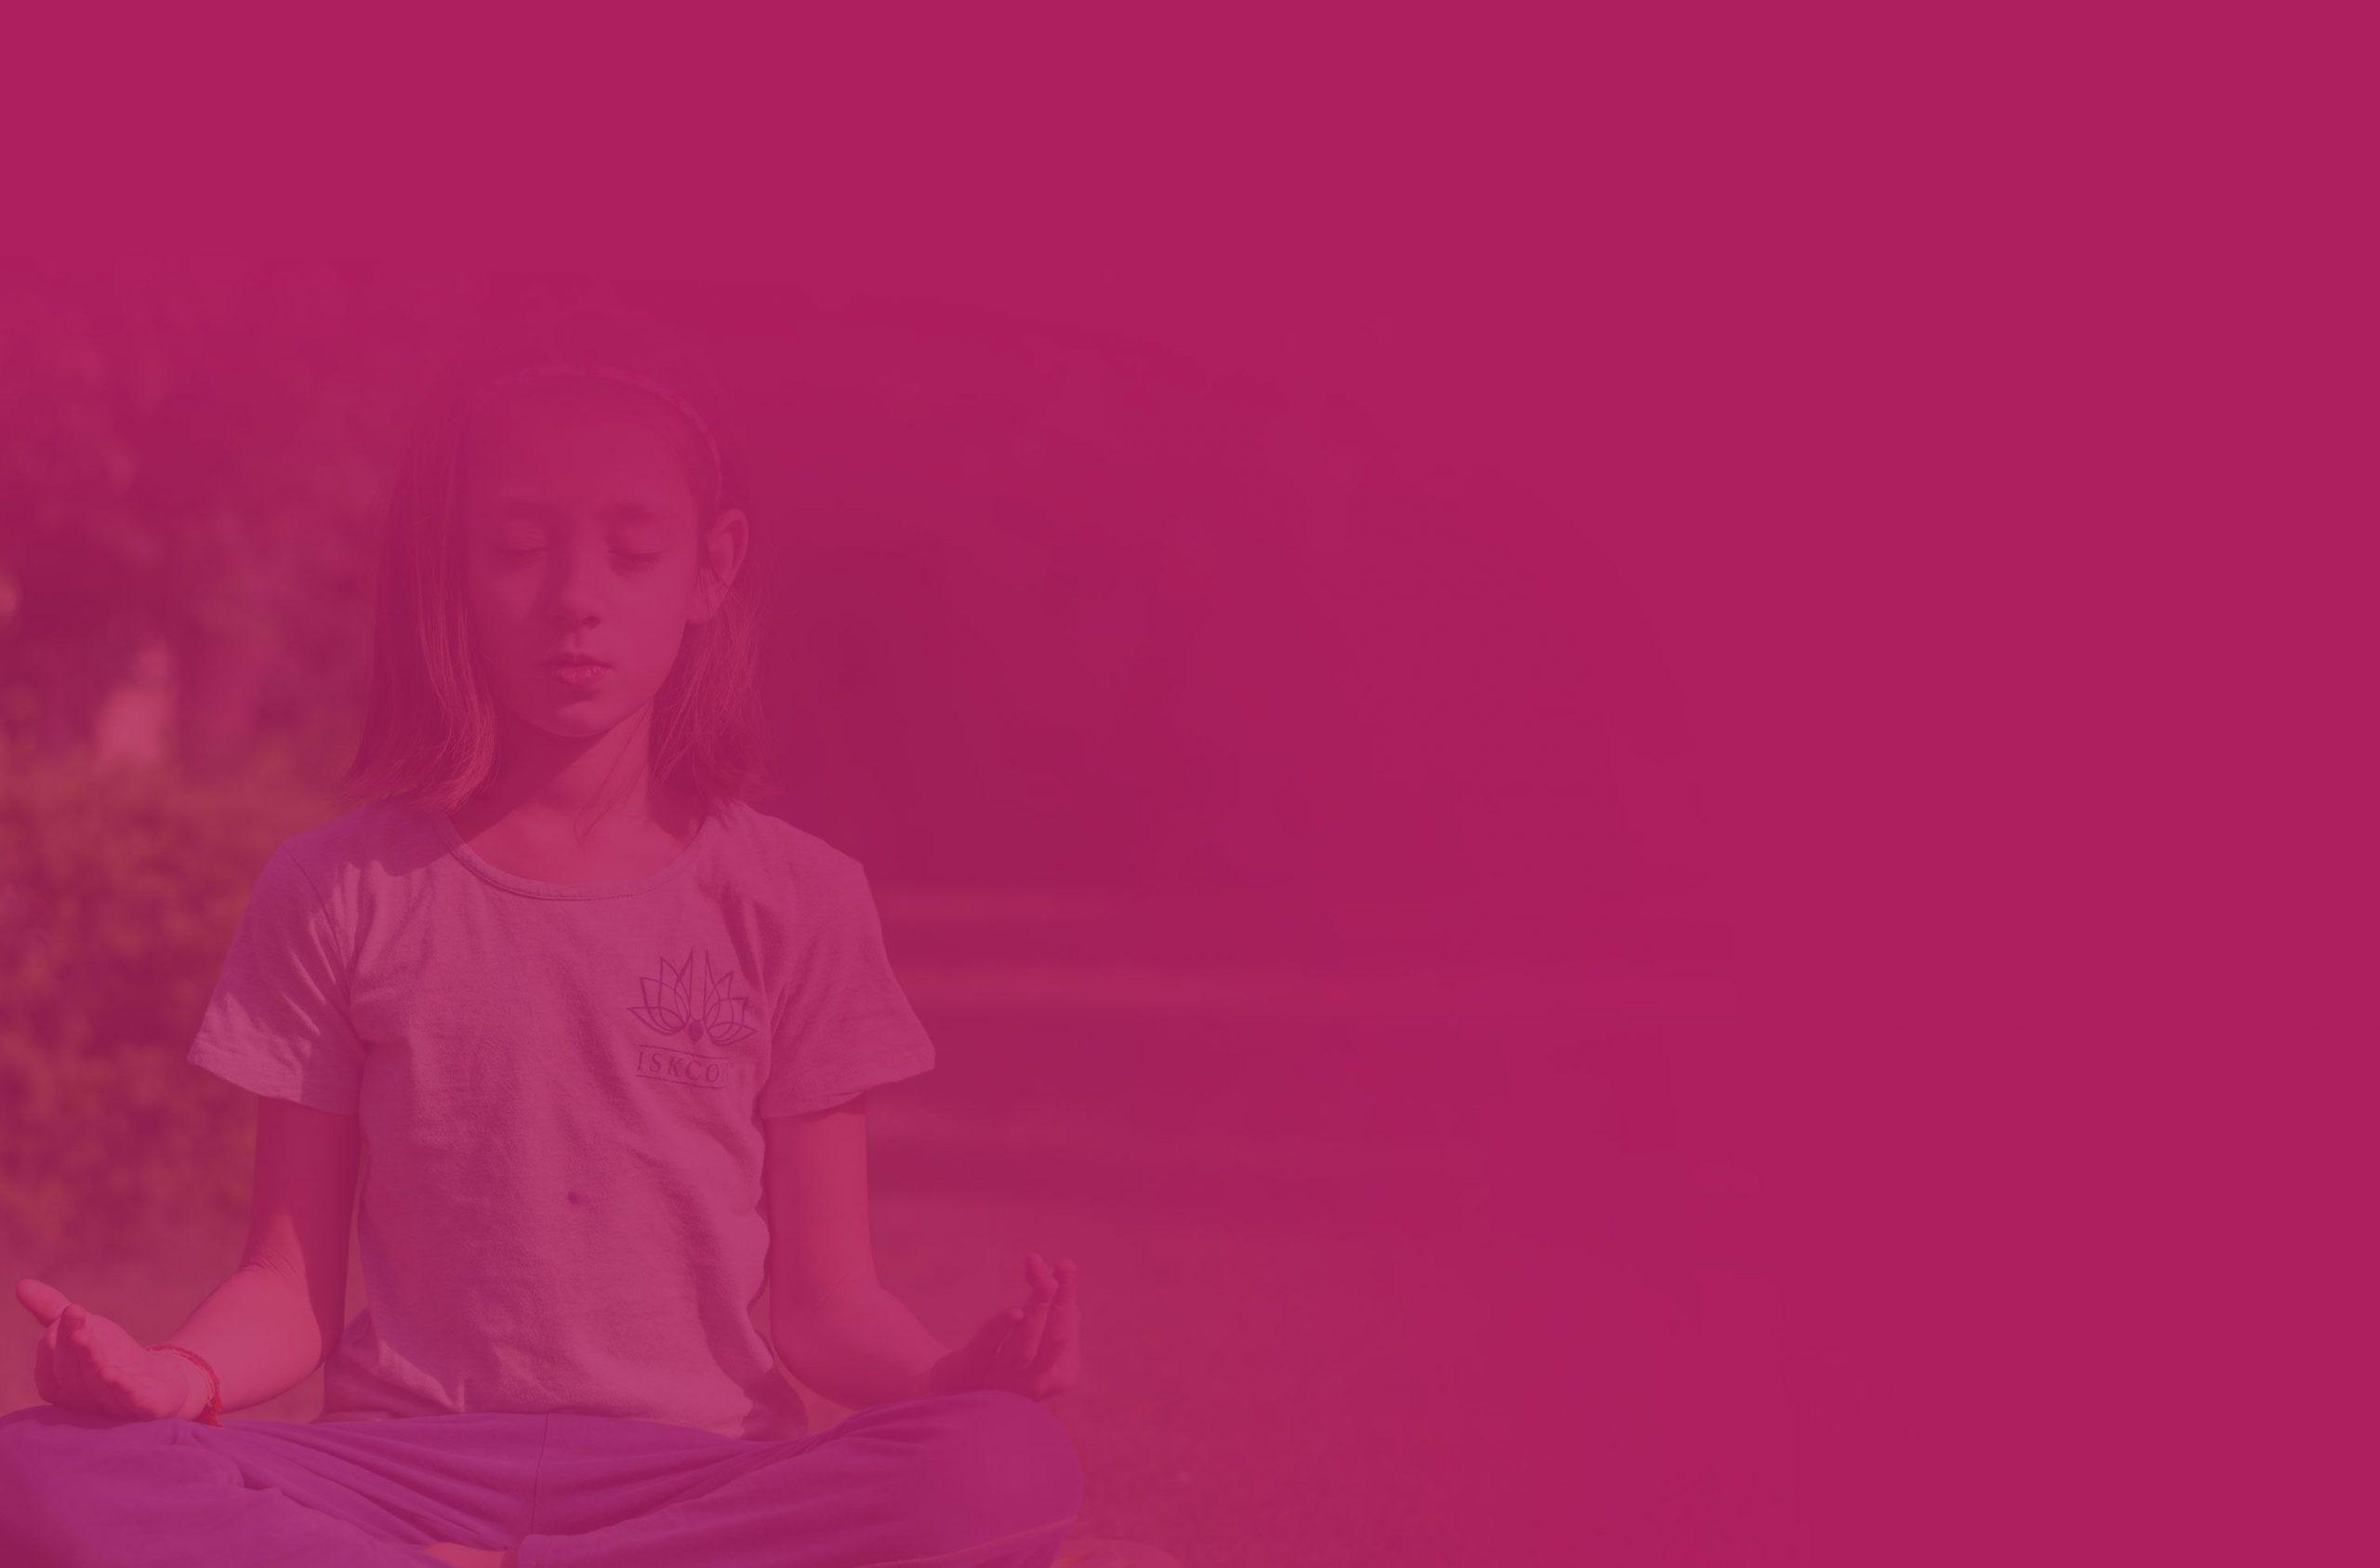 yoga-for-children-background